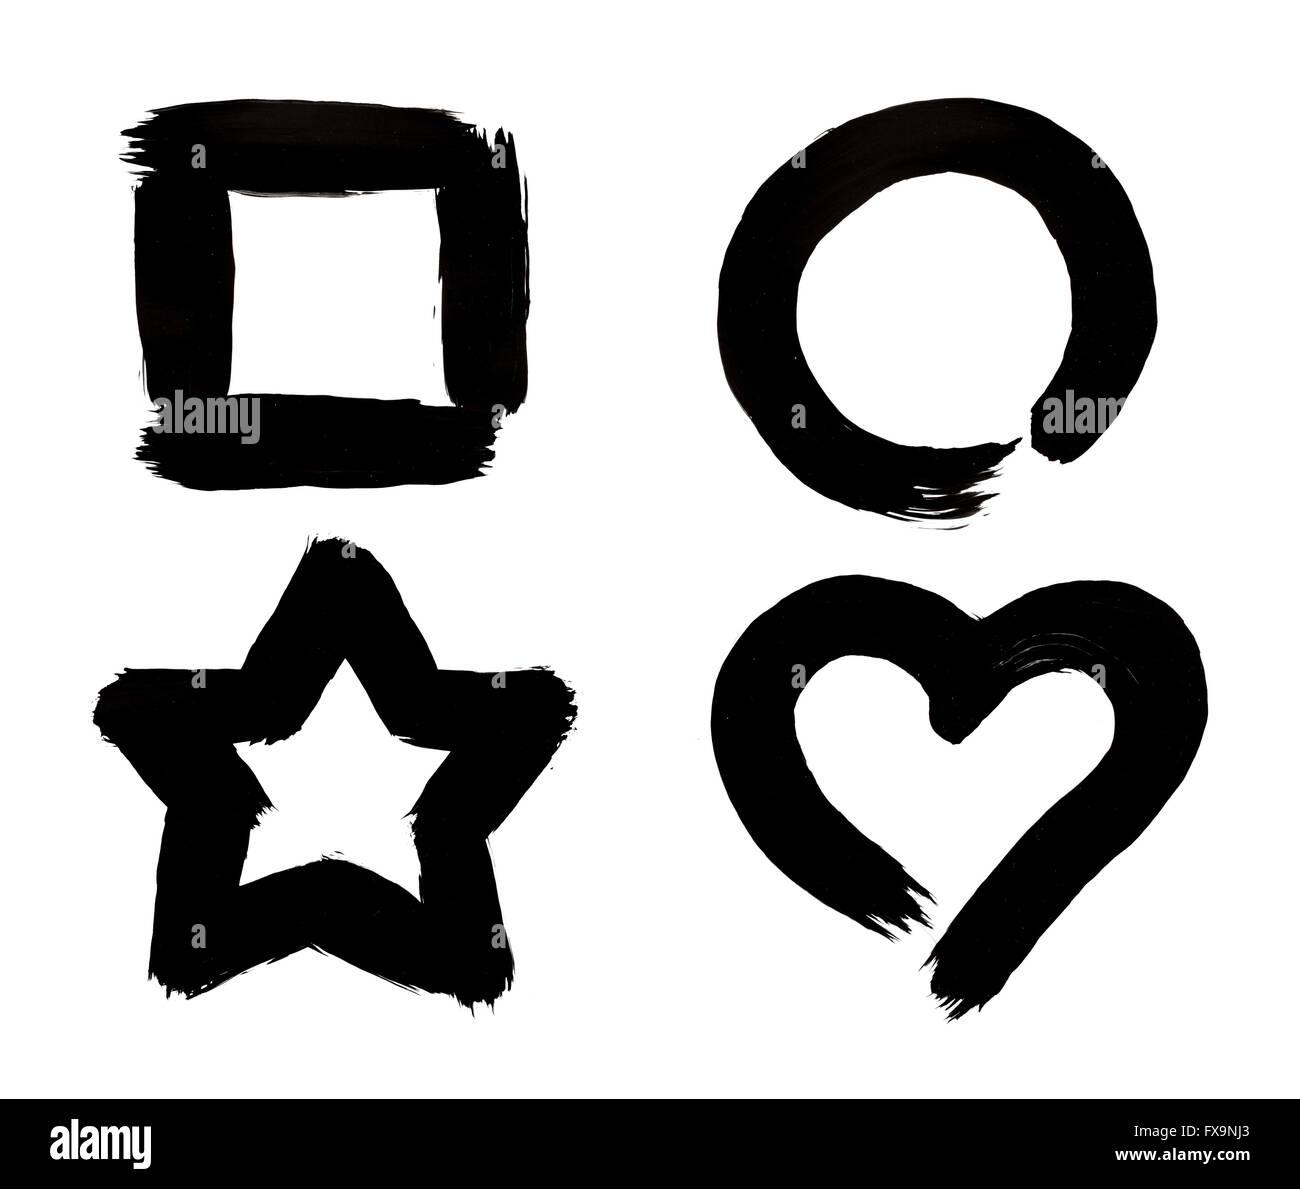 Square Circle Star And Heart Symbols Black Paint Brush Strokes